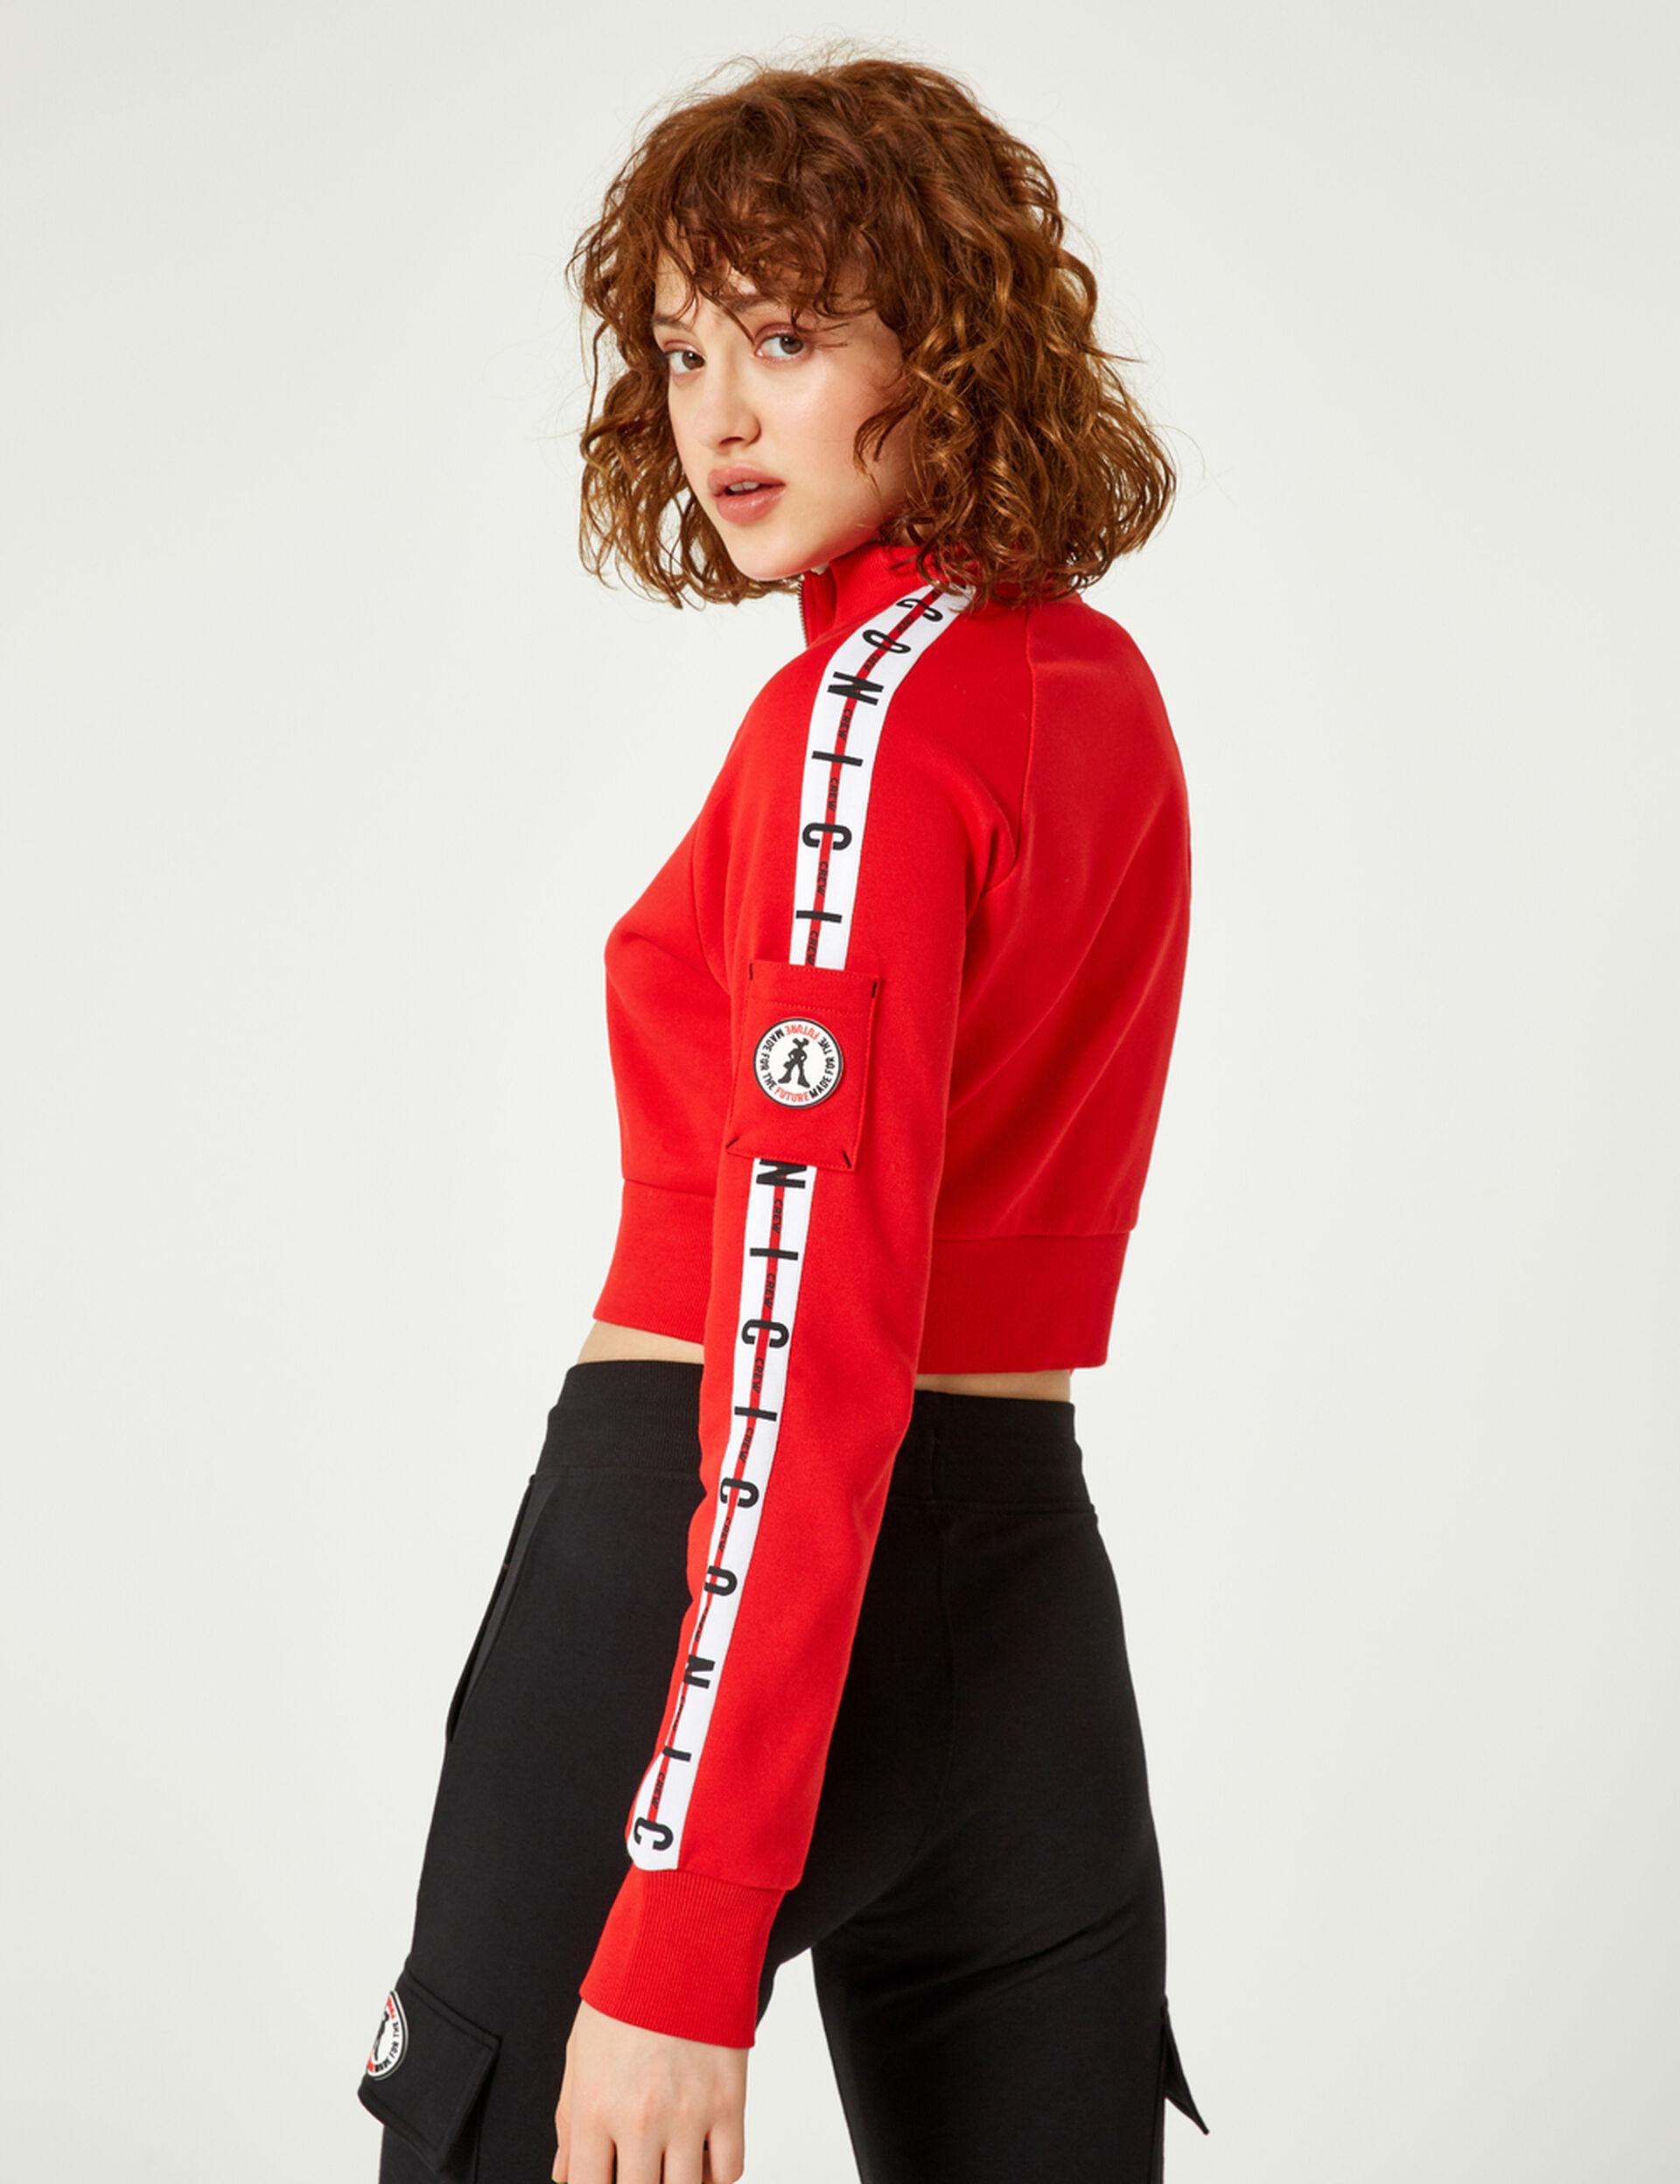 Cropped red zip-up sweatshirt